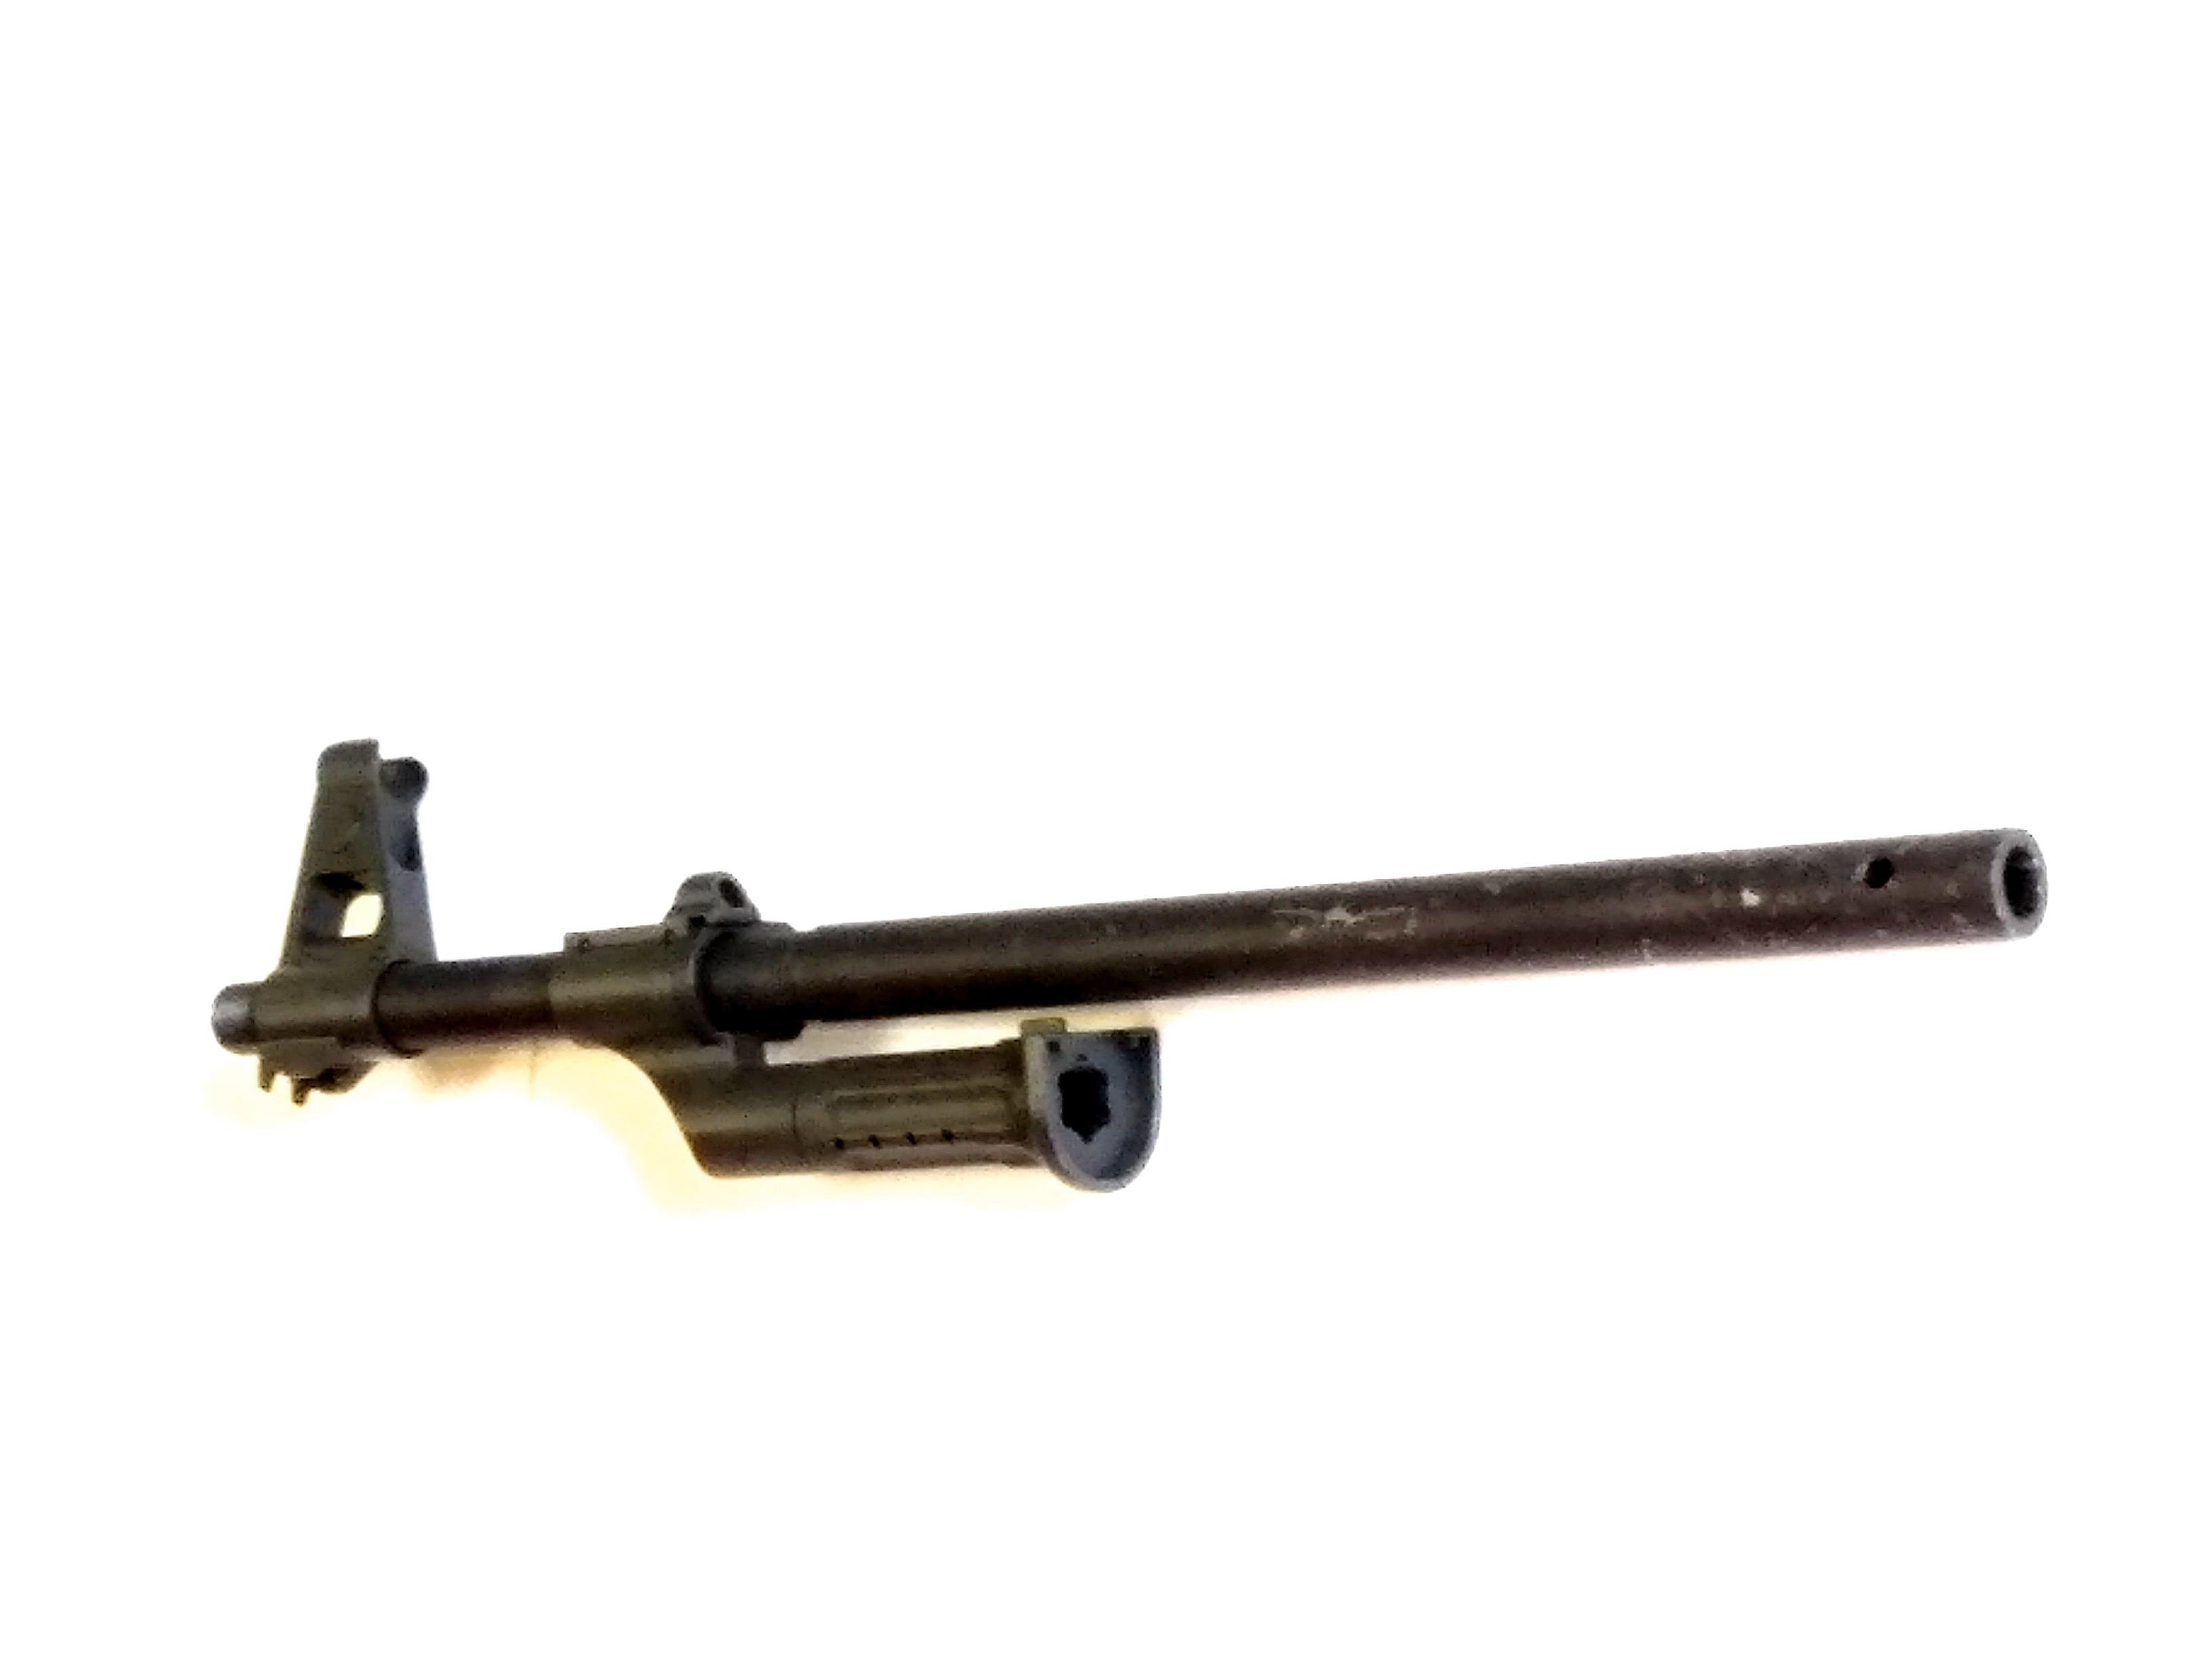 AK47 METAL OUTER BARREL W/FRONT SIGHT